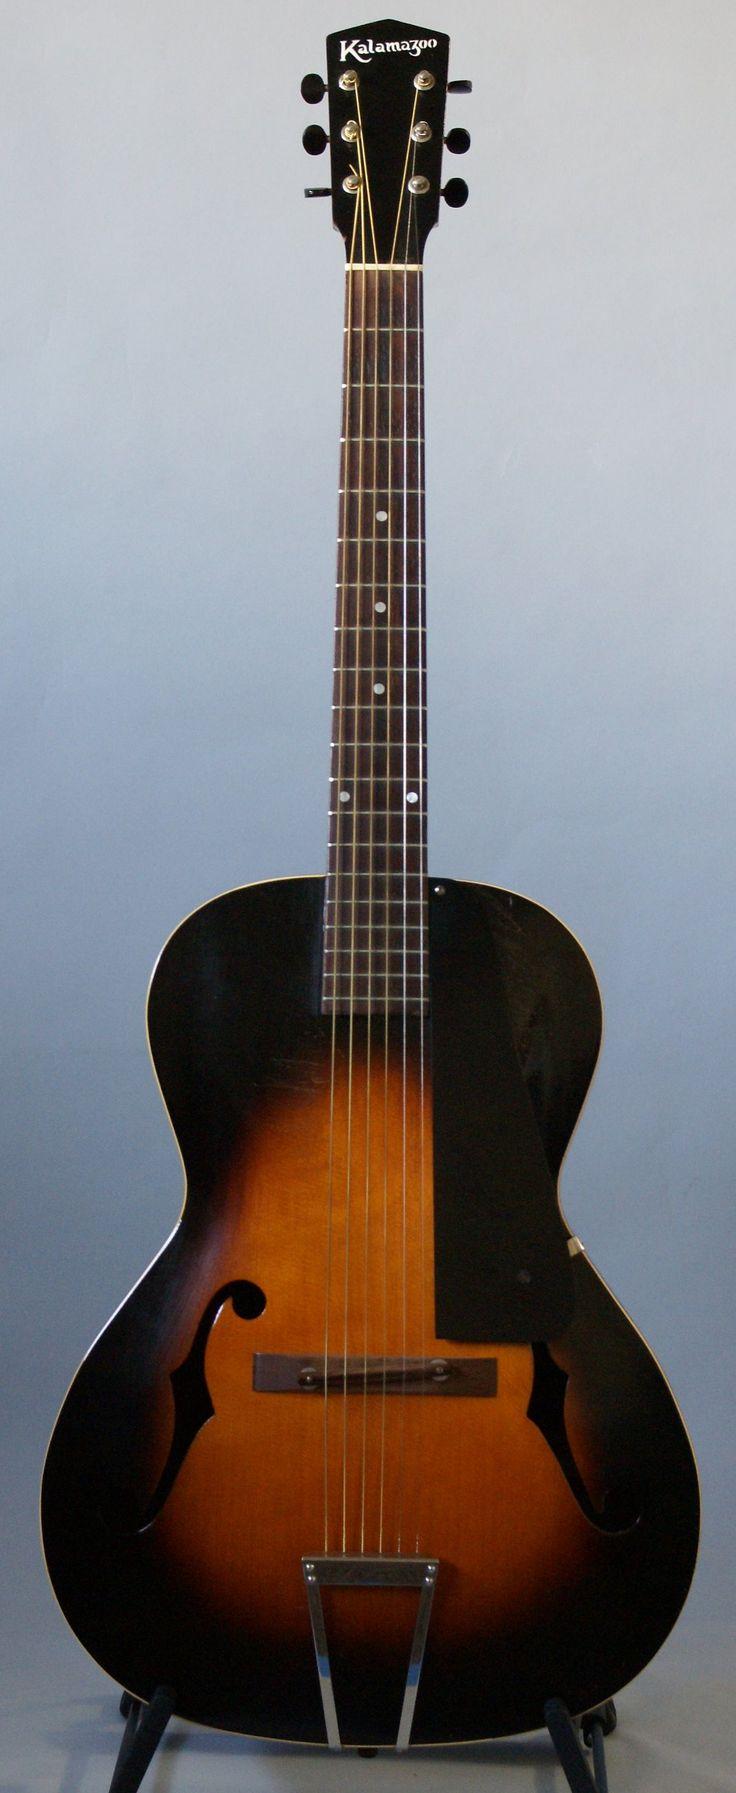 1932 kalamazoo archtop acoustic dream guitars pinterest vintage 1930s and acoustic. Black Bedroom Furniture Sets. Home Design Ideas